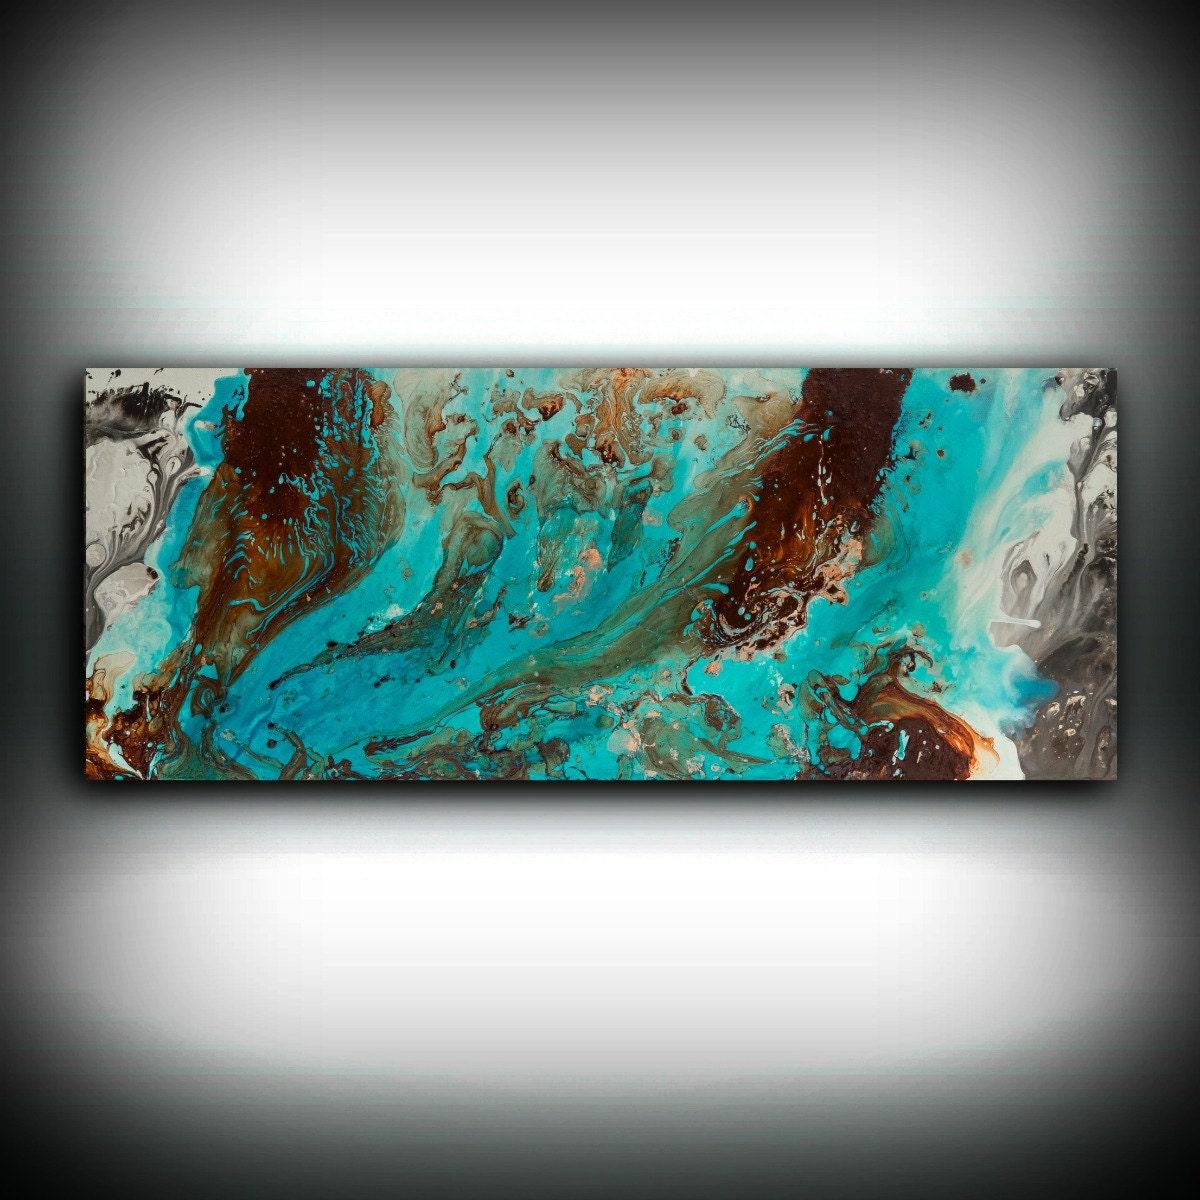 Art Décor: Aqua Print, Blue And Brown Wall Art Decor, Colourful